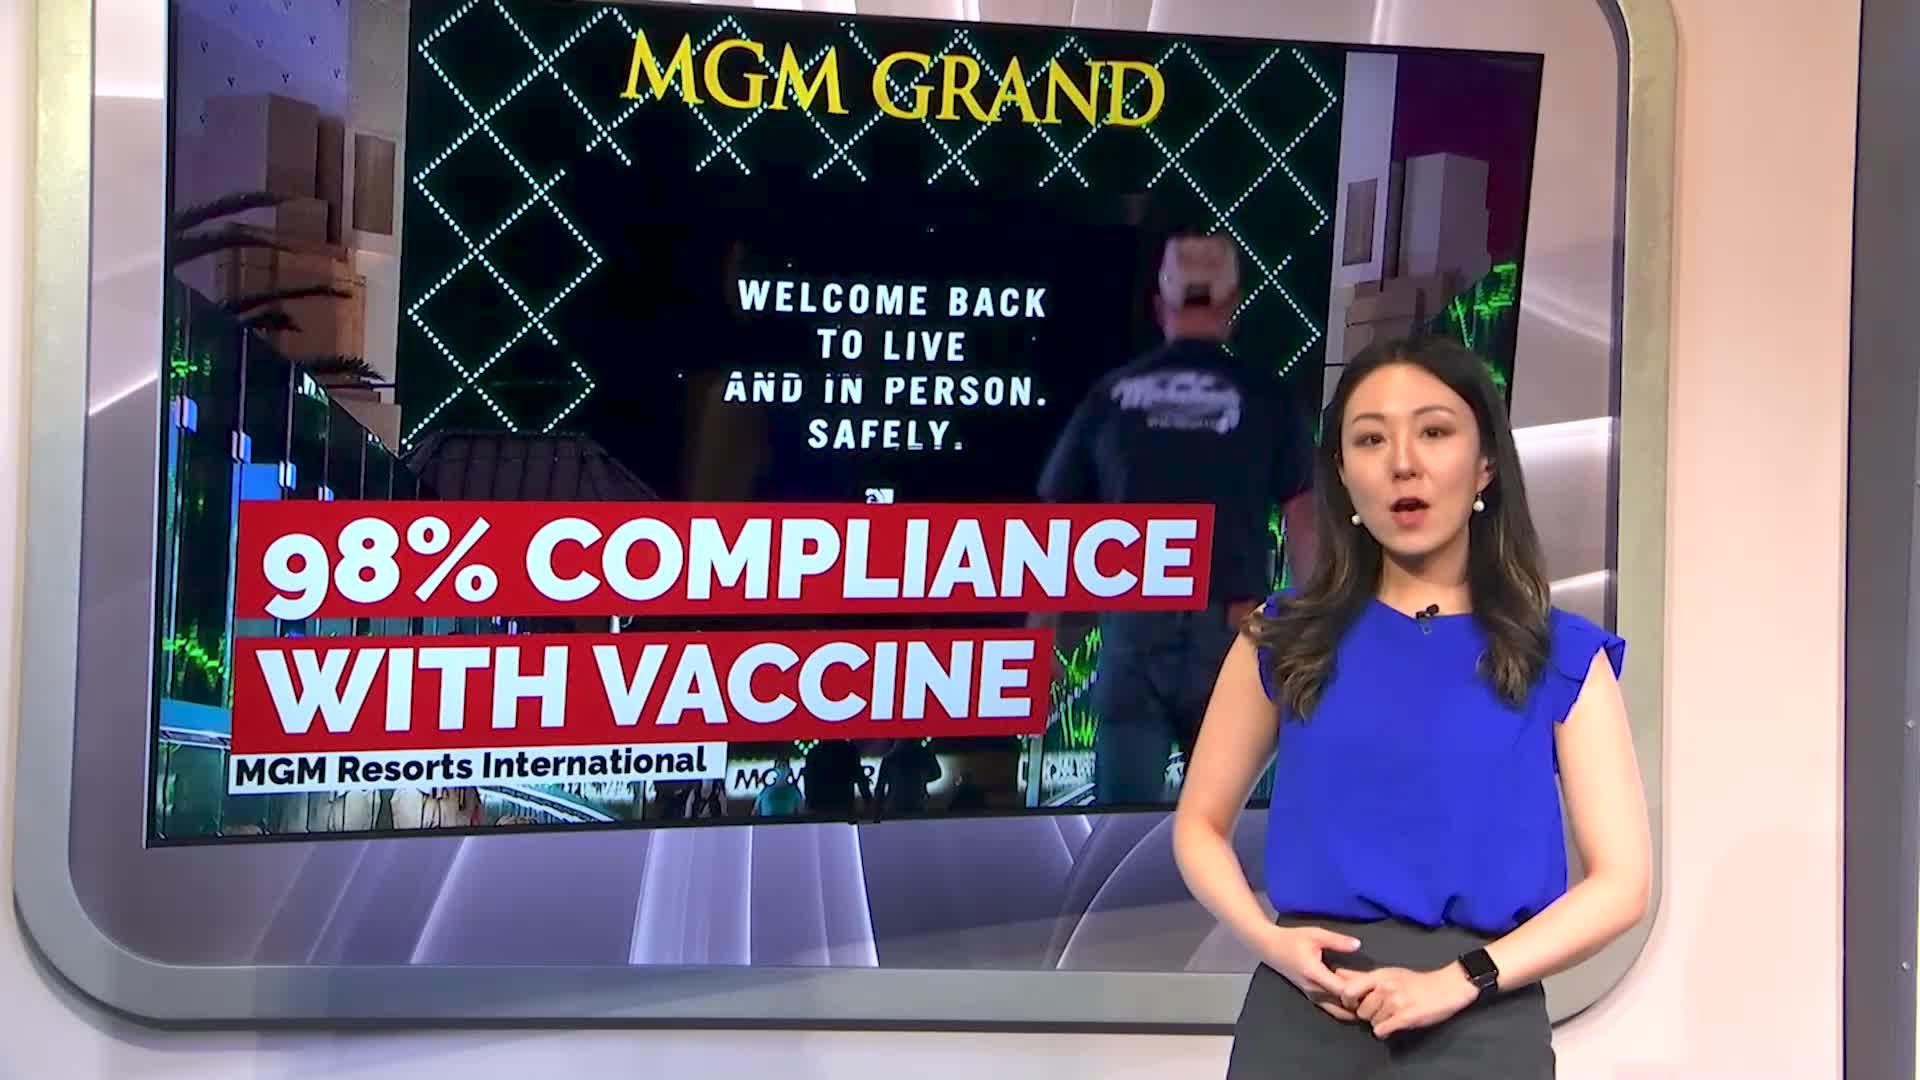 7@7PM Vaccine Mandate Outcome at MGM